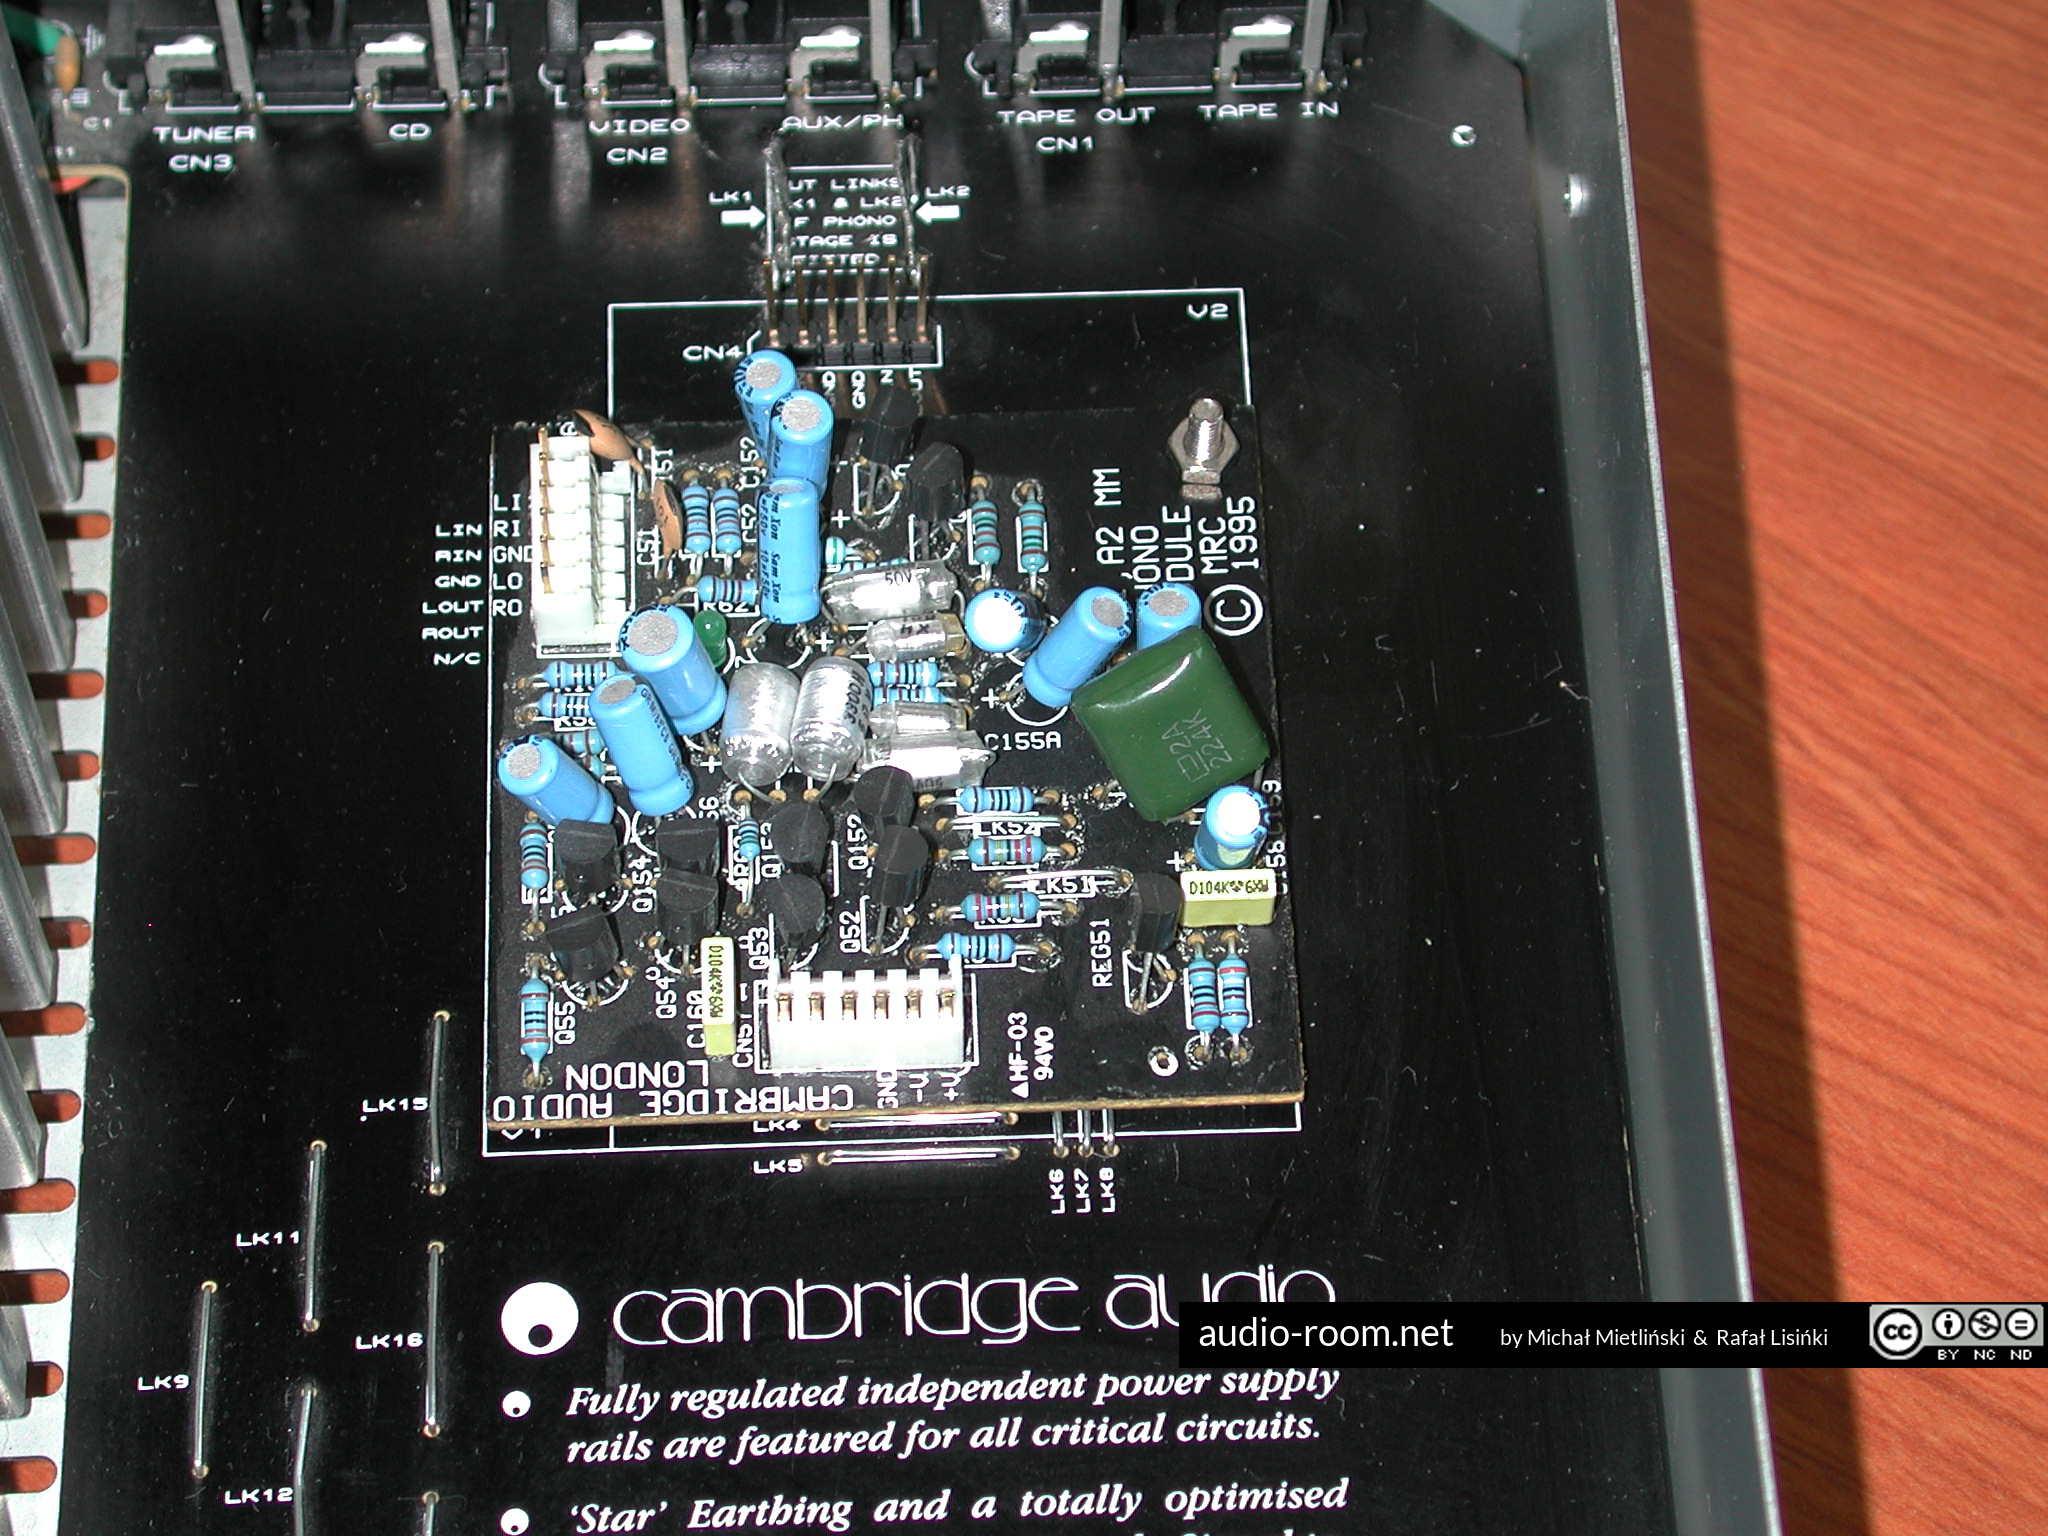 cambridge-audio-a2-dscn0906